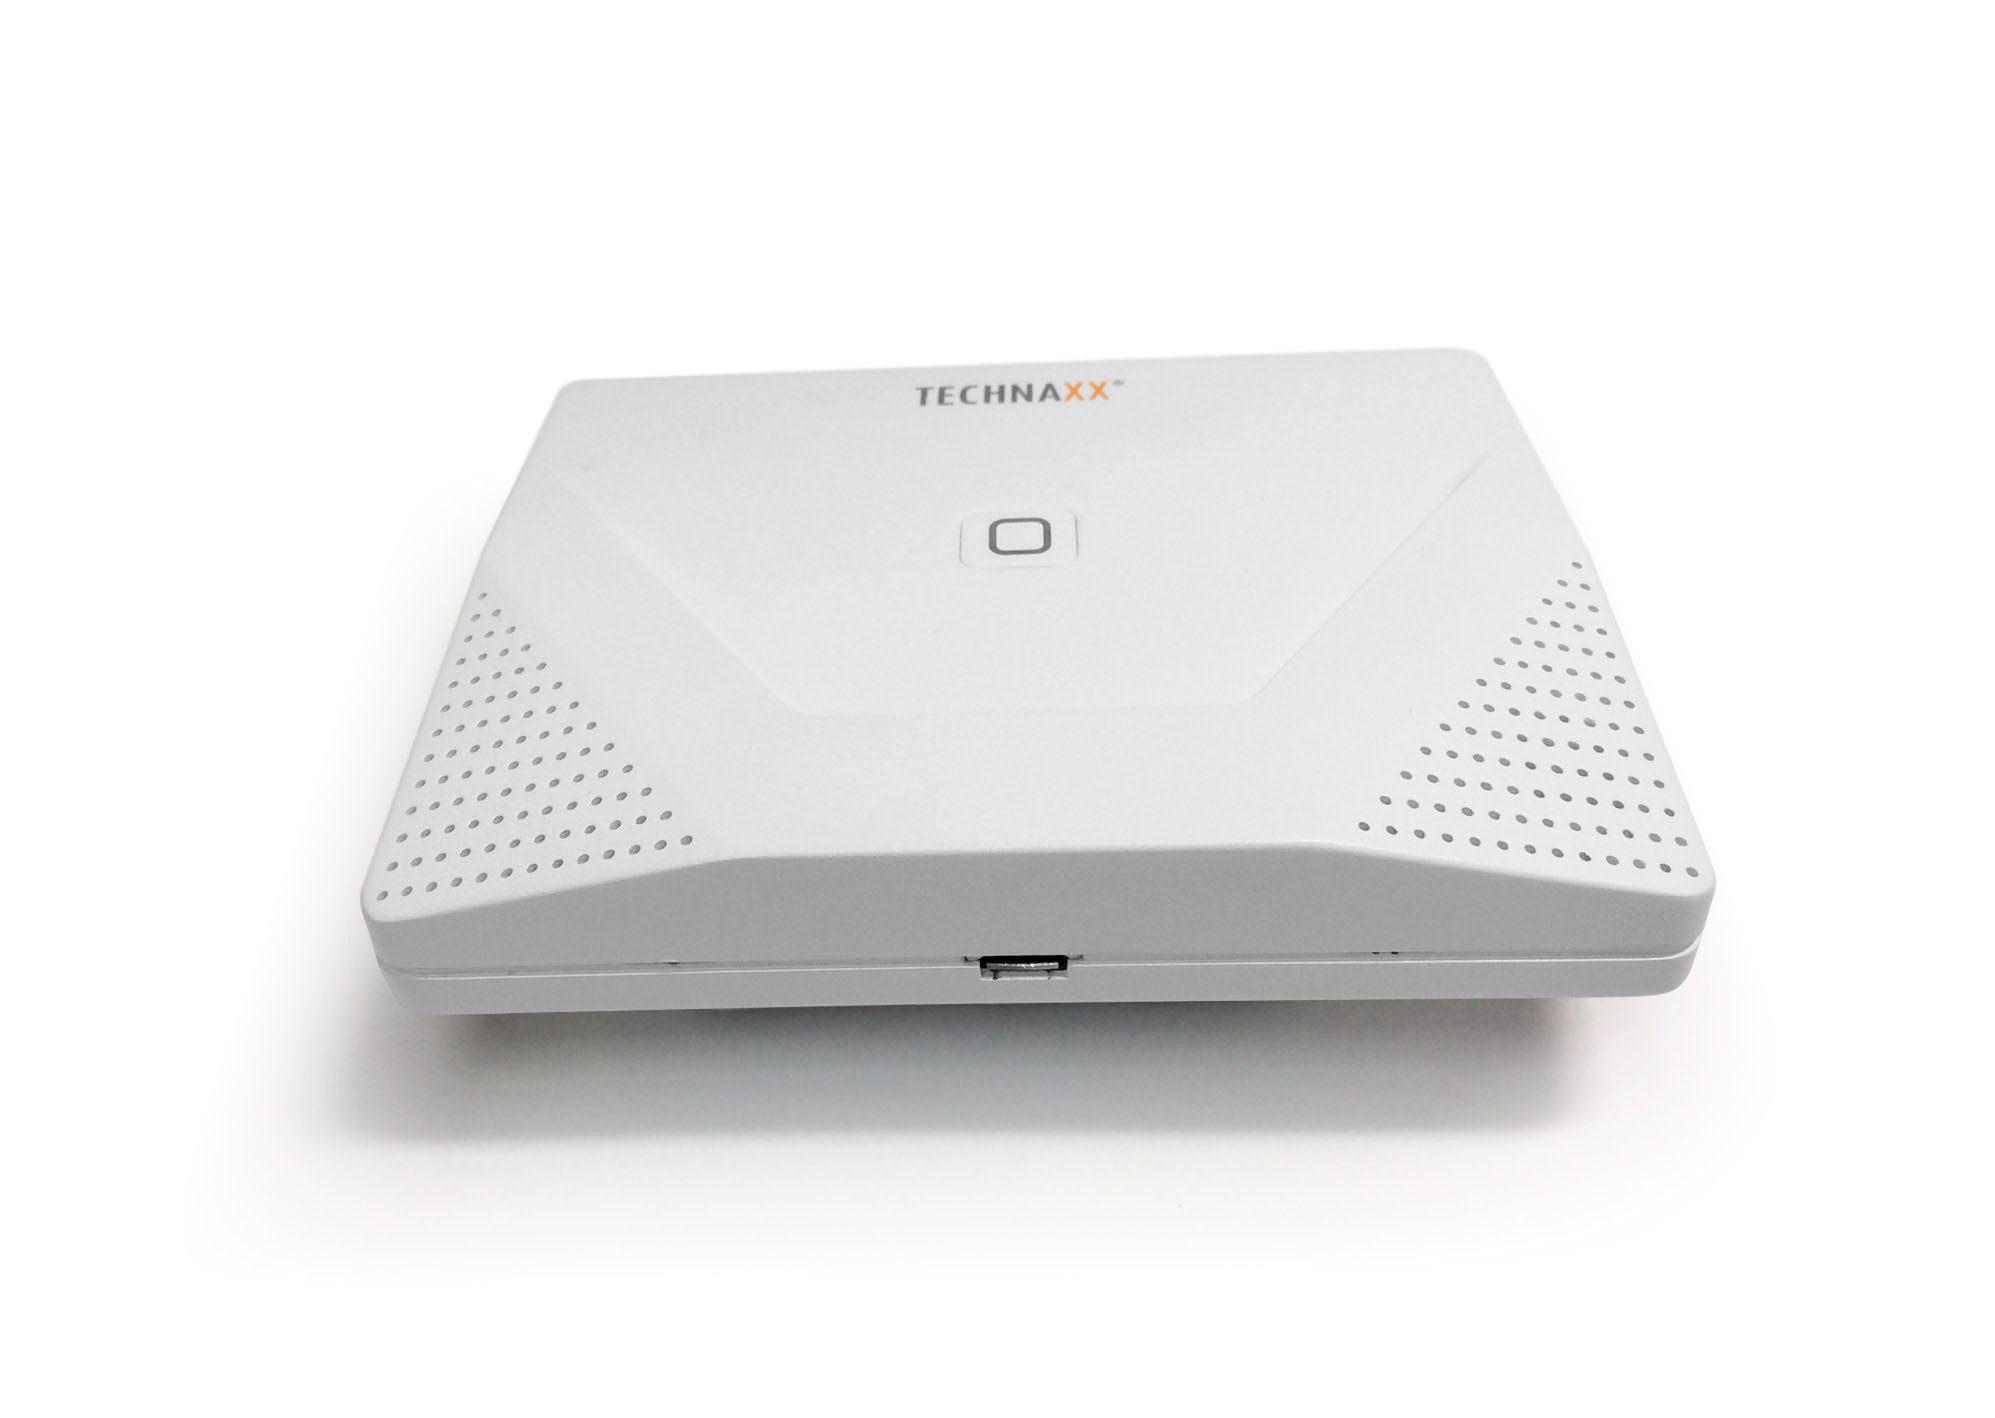 Technaxx Überwachungskamera »Technaxx WiFi Smart Alarm System Starter Kit TX-84«